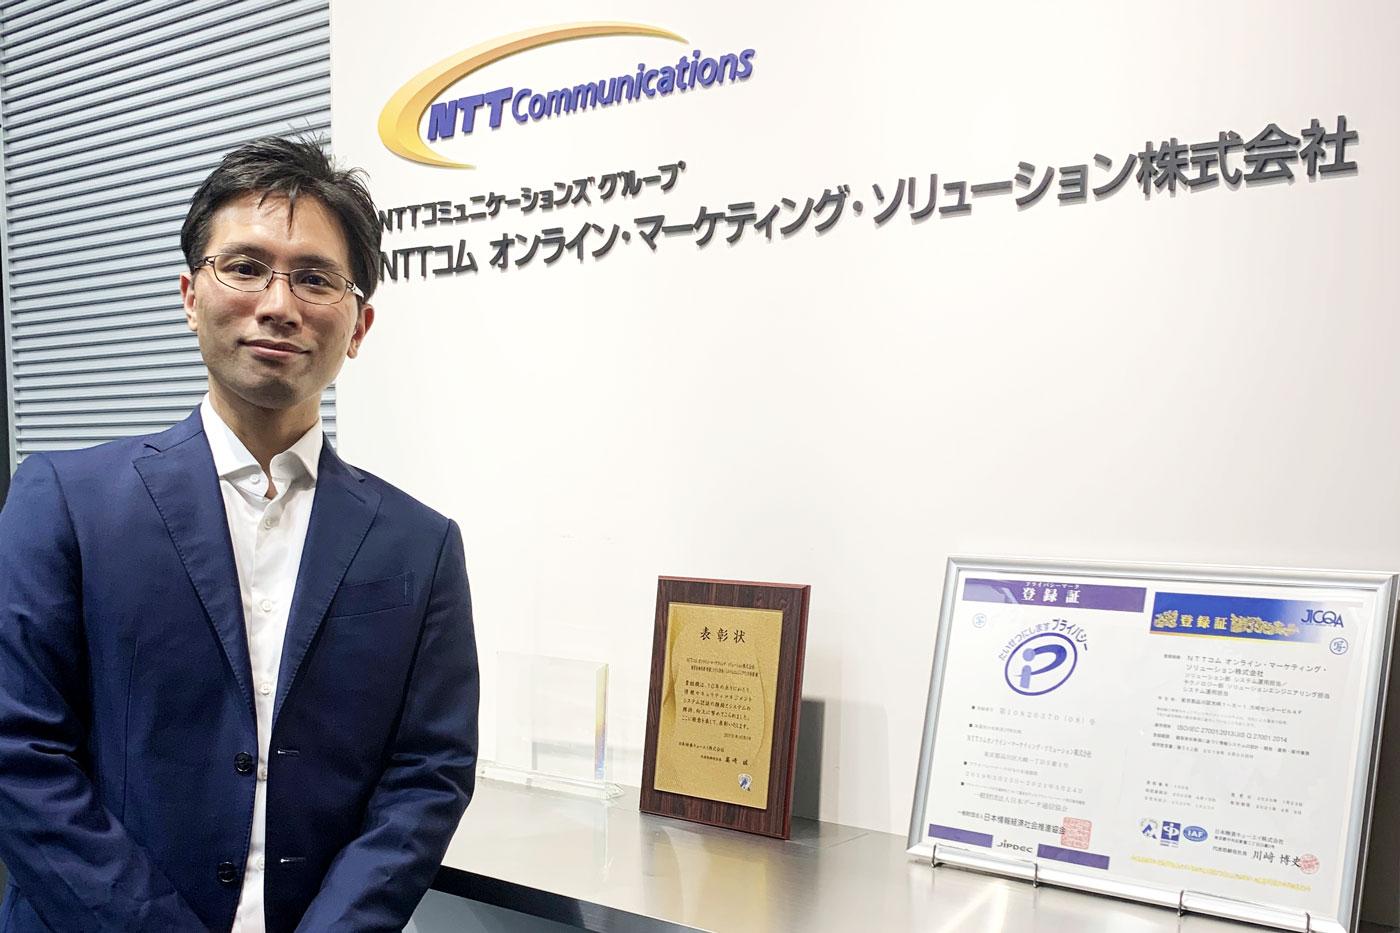 NTTコム オンライン・マーケティング・ソリューション株式会社 部長 黒田 和宏様